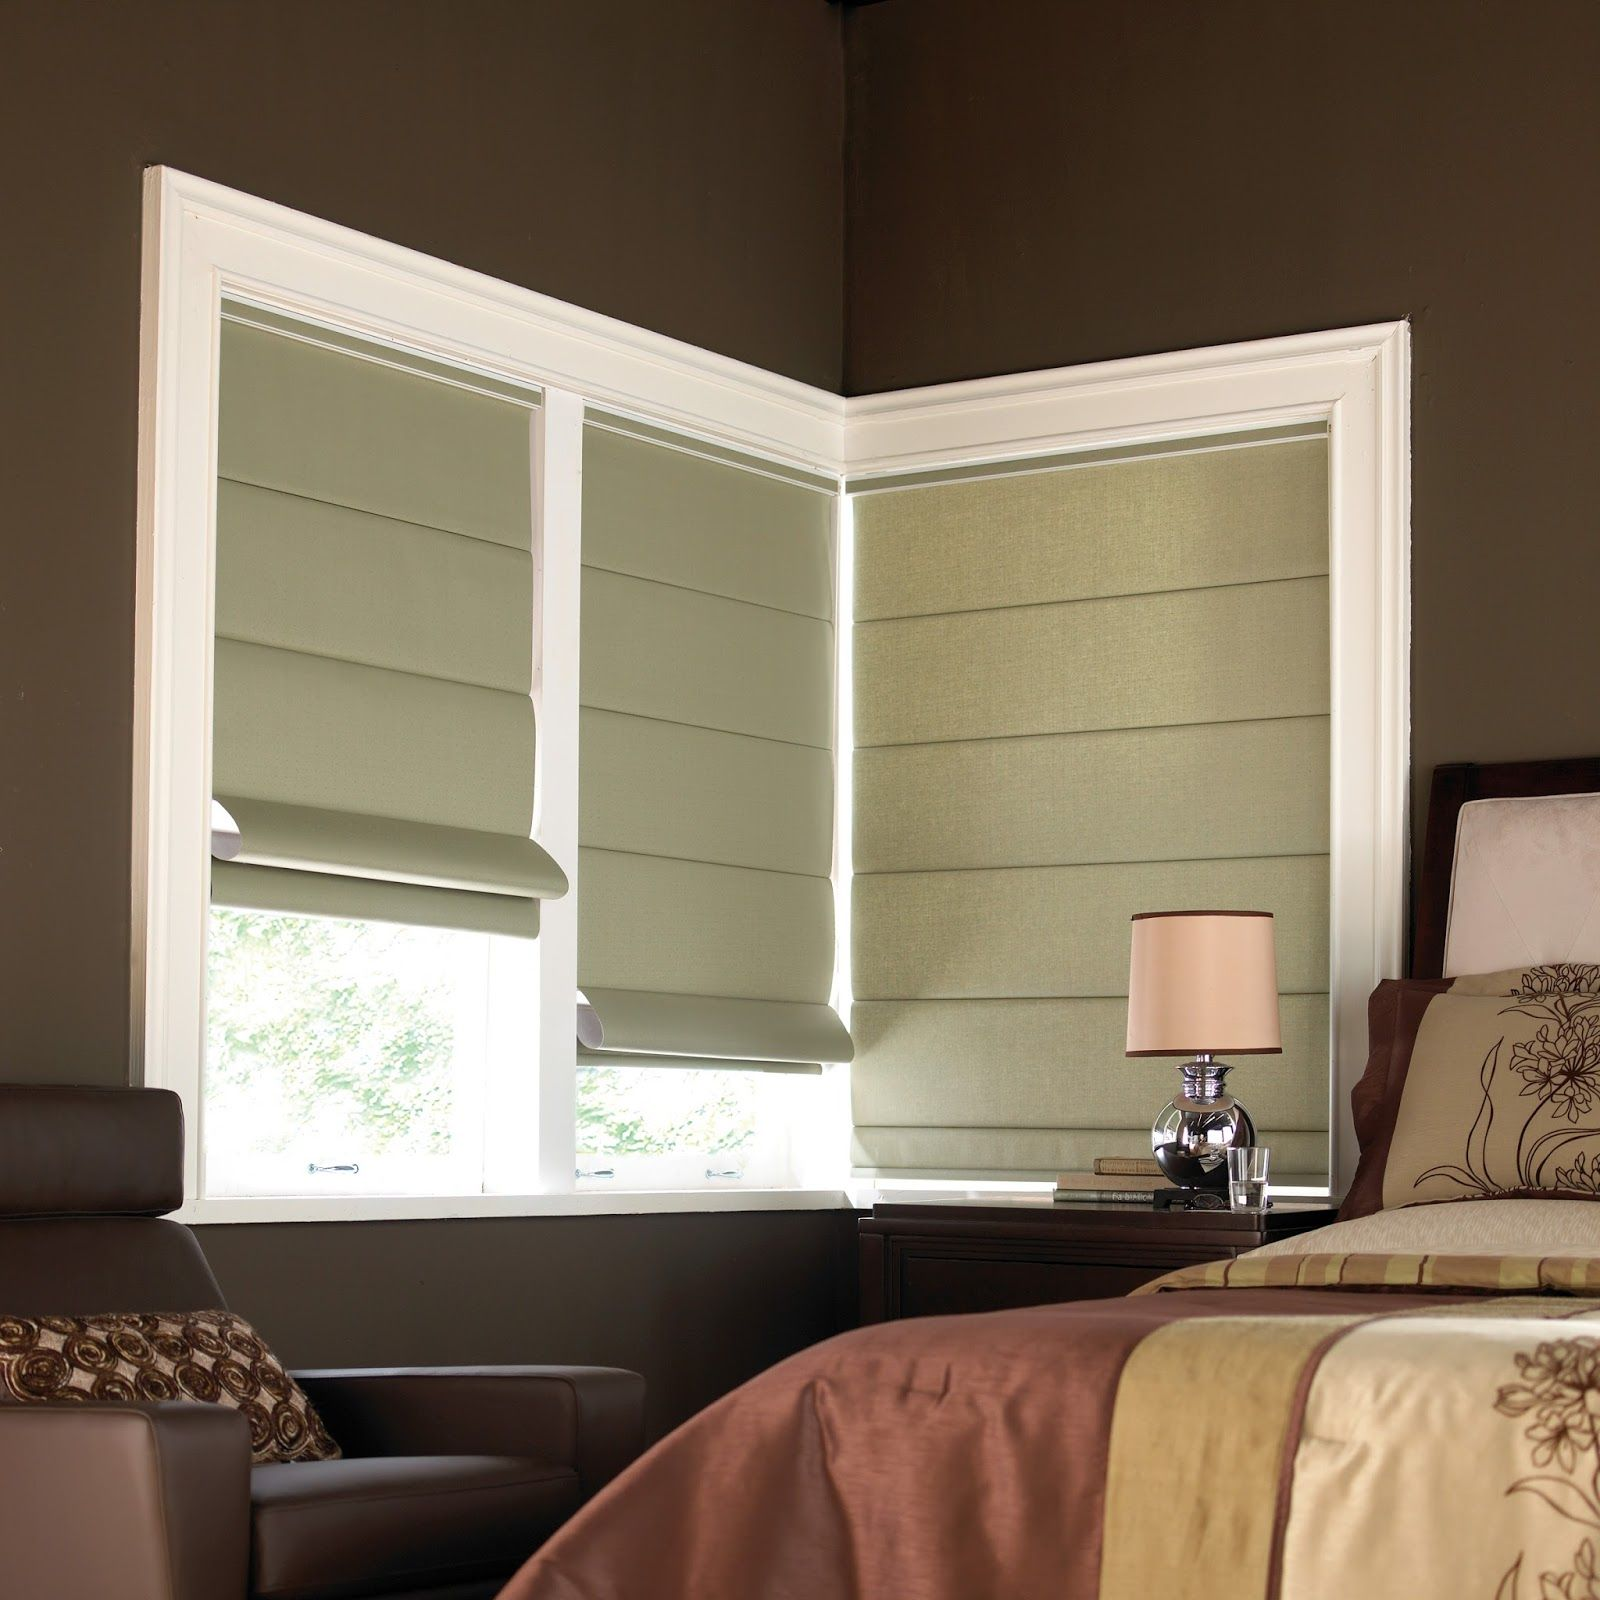 Hang Blinds Outside Window Frame: Http://1.bp.blogspot.com/-AC3A_Jppcjg/VcWETA_TAtI